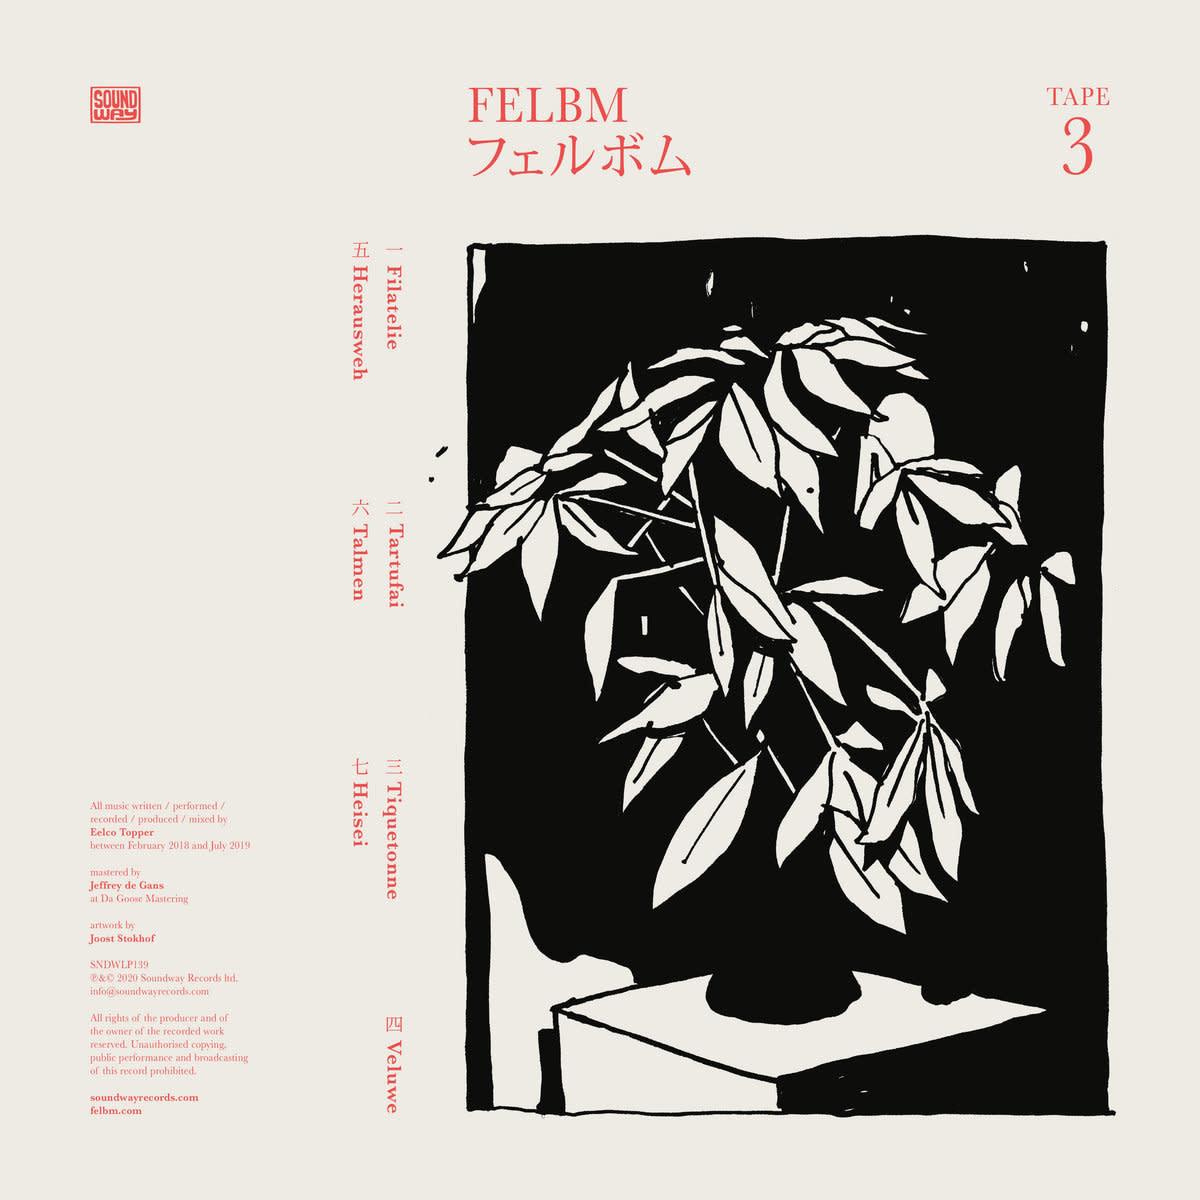 Soundway Records Felbm - Tape 3/Tape 4